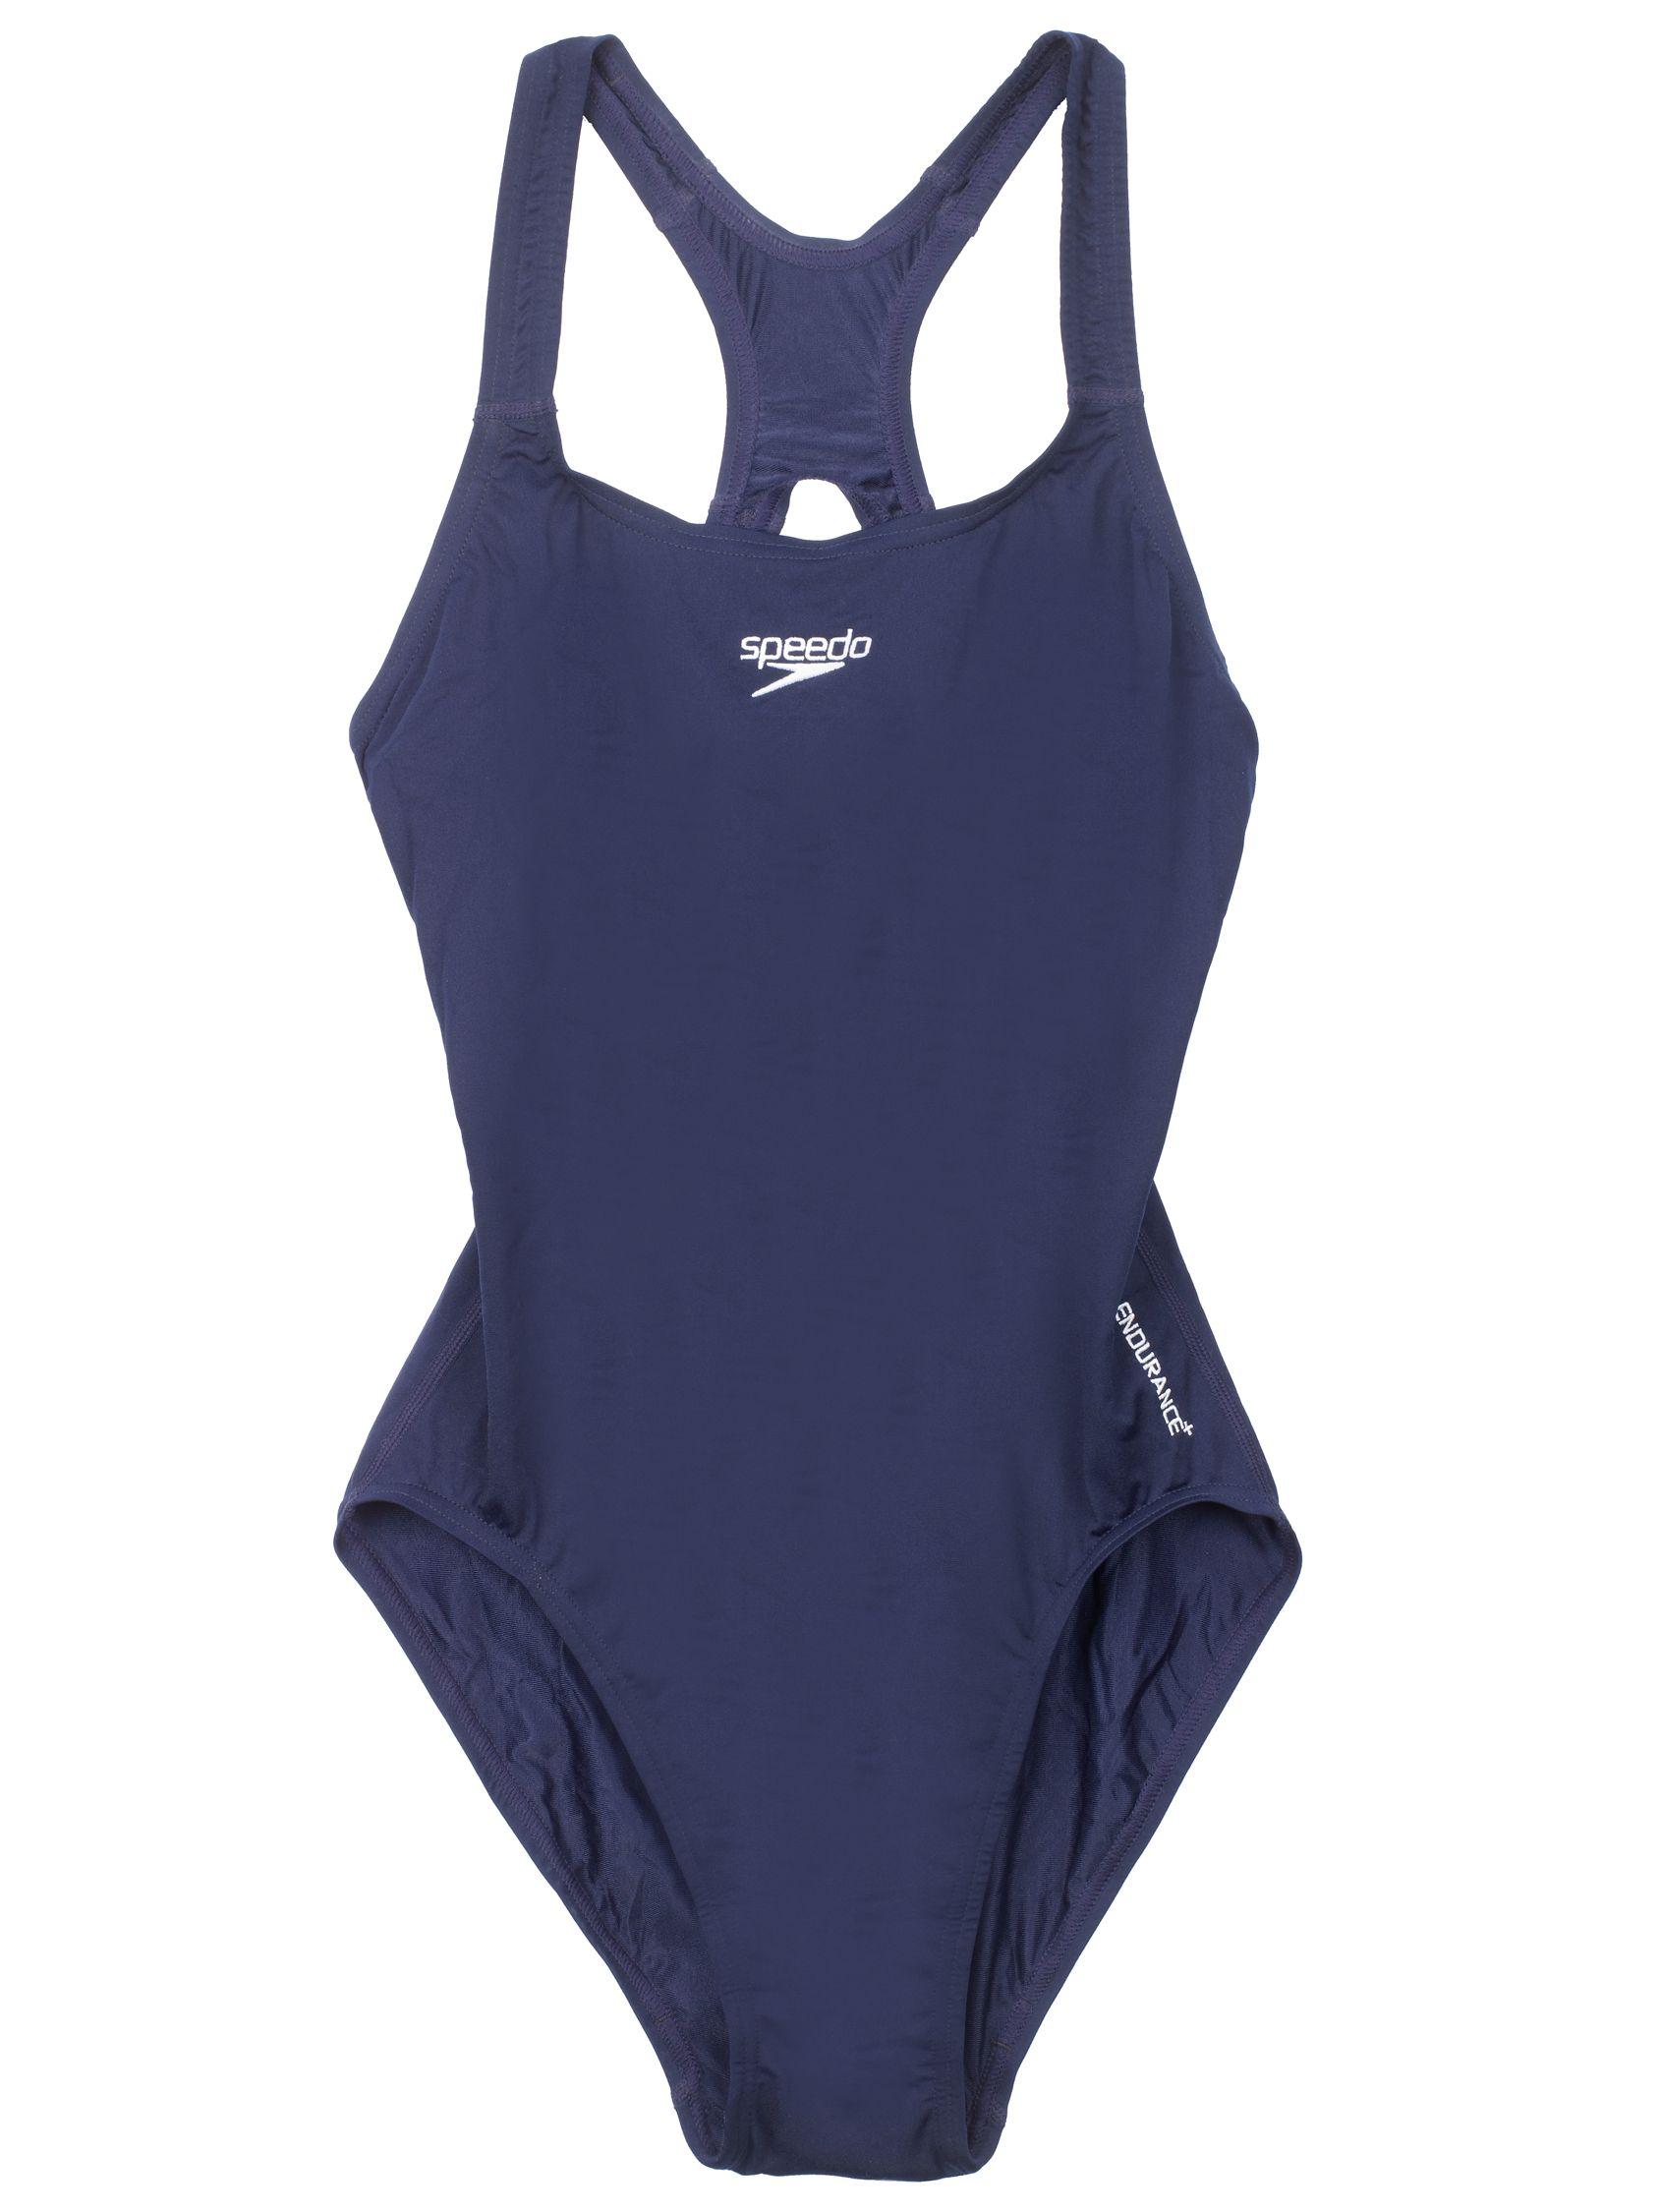 Speedo Speedo Girls' Medalist Swimsuit, Navy